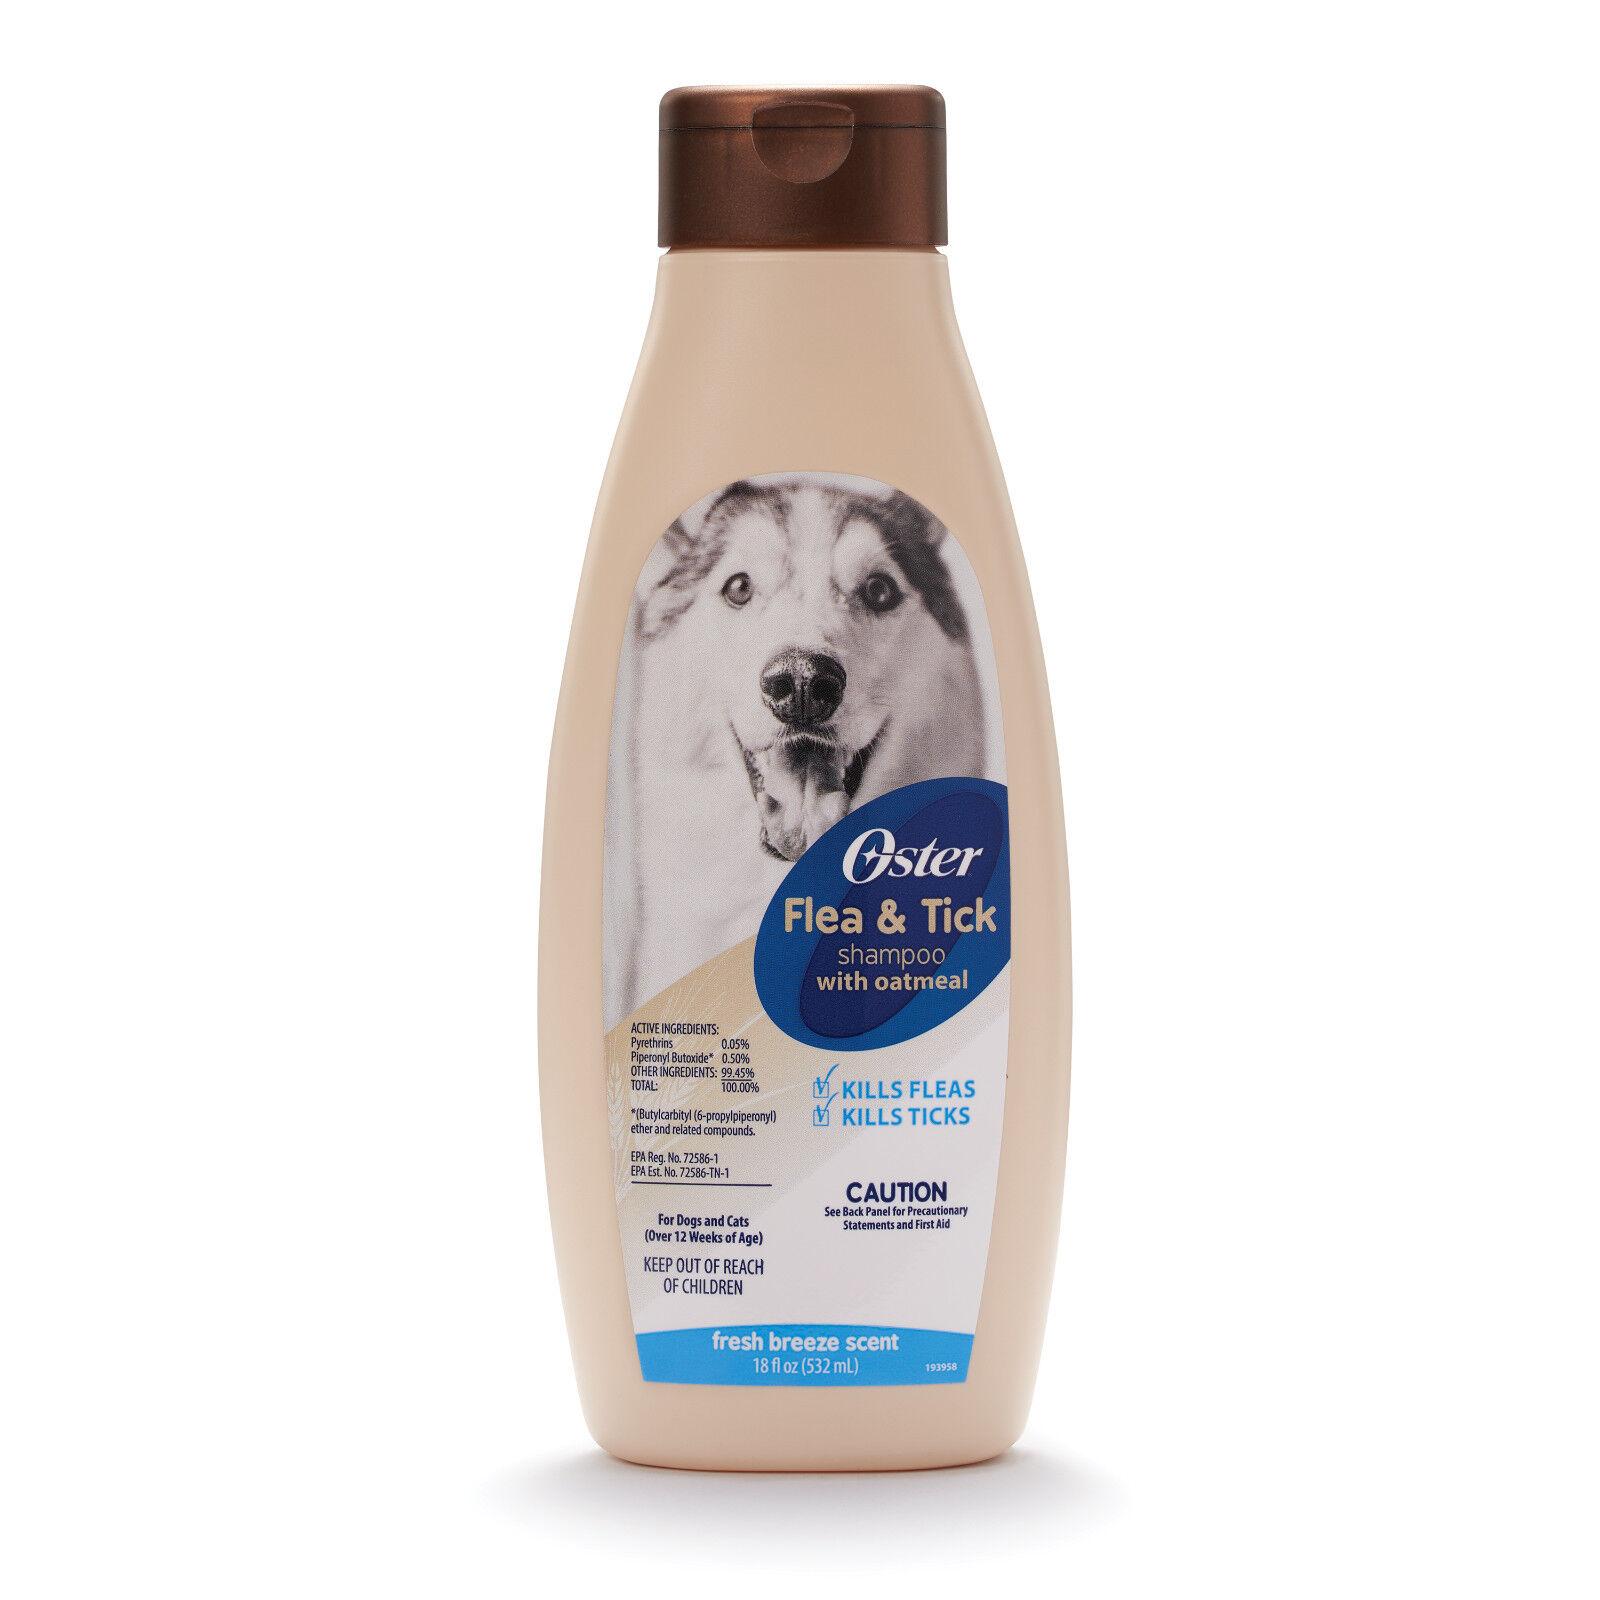 Oster Flea & Tick Shampoo with Oatmeal, Mandarin Violet, 18